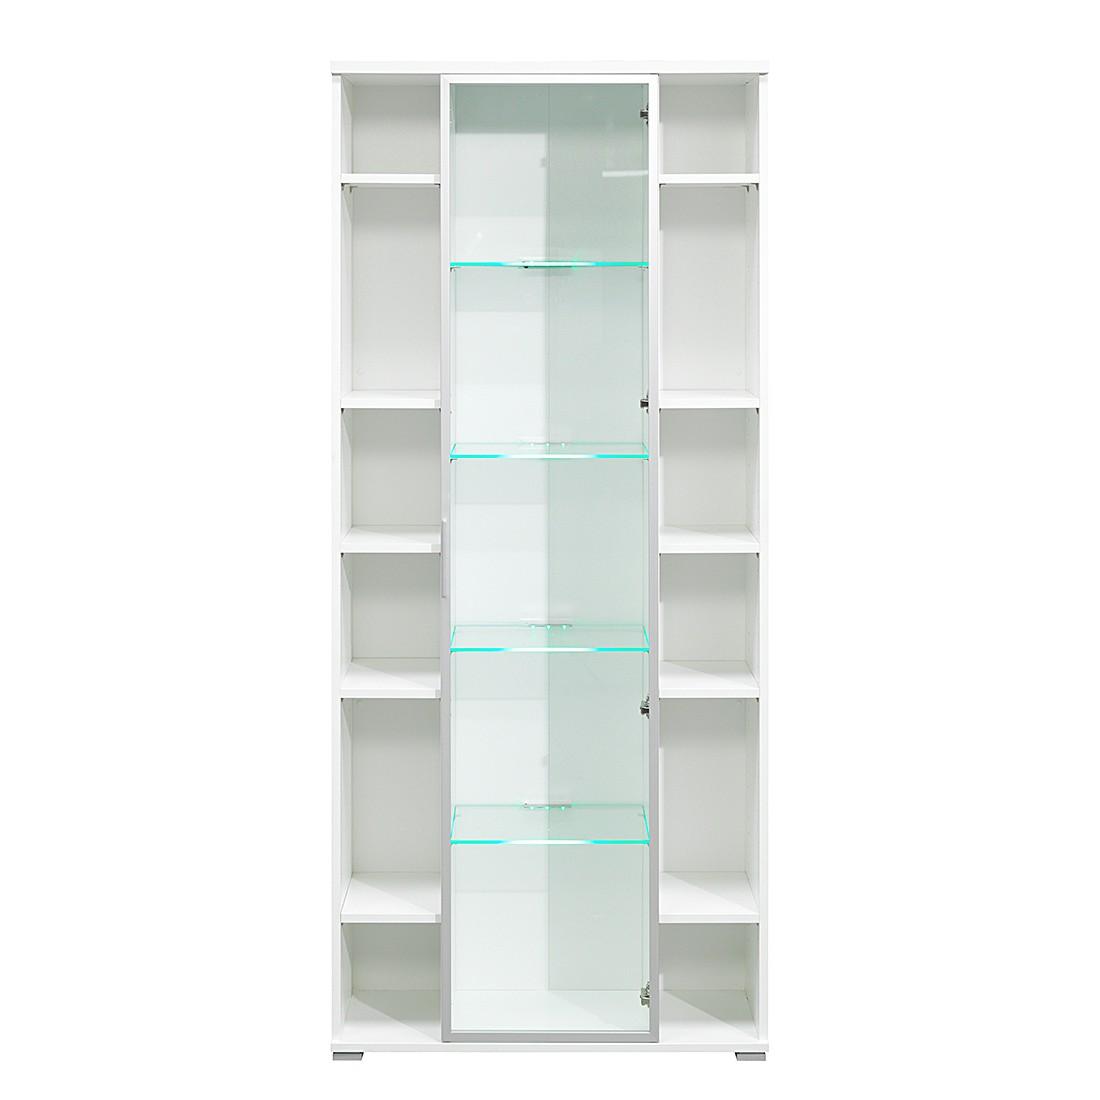 b cherregale archive seite 8 von 15. Black Bedroom Furniture Sets. Home Design Ideas